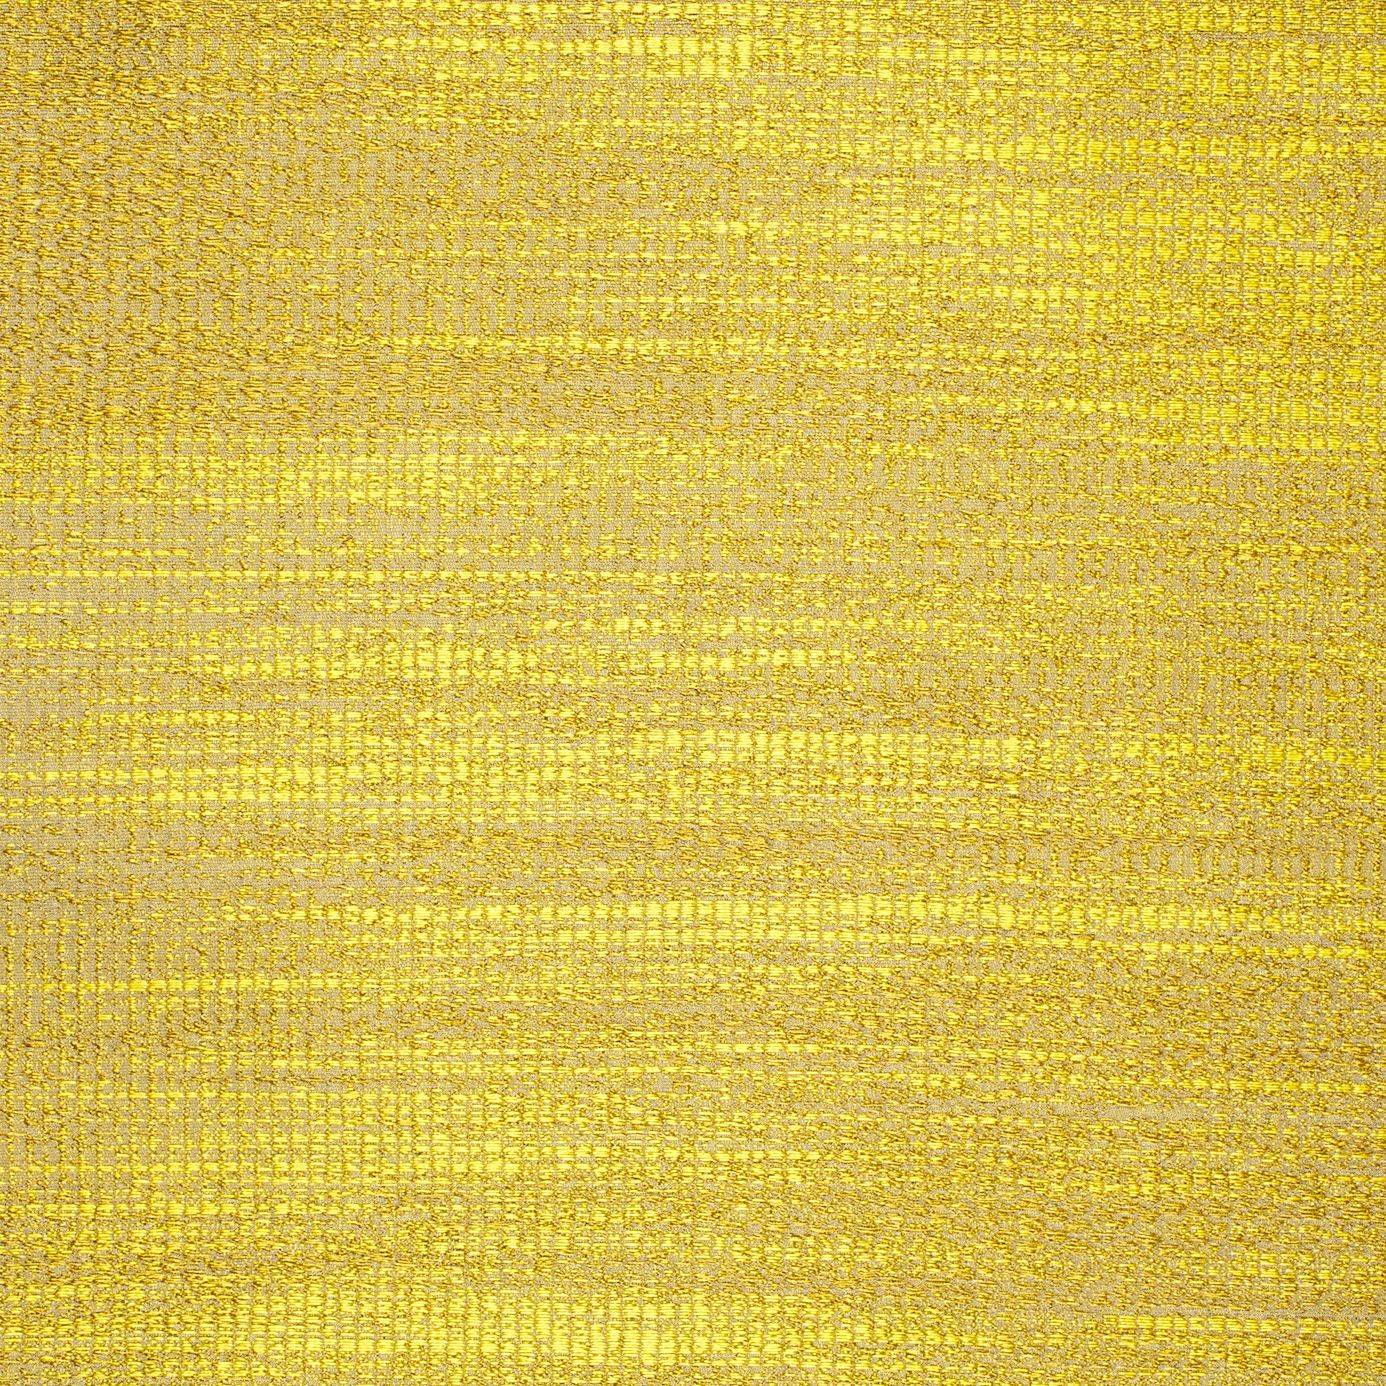 Mariposa Fabric Mustard 130610 Harlequin Impasto